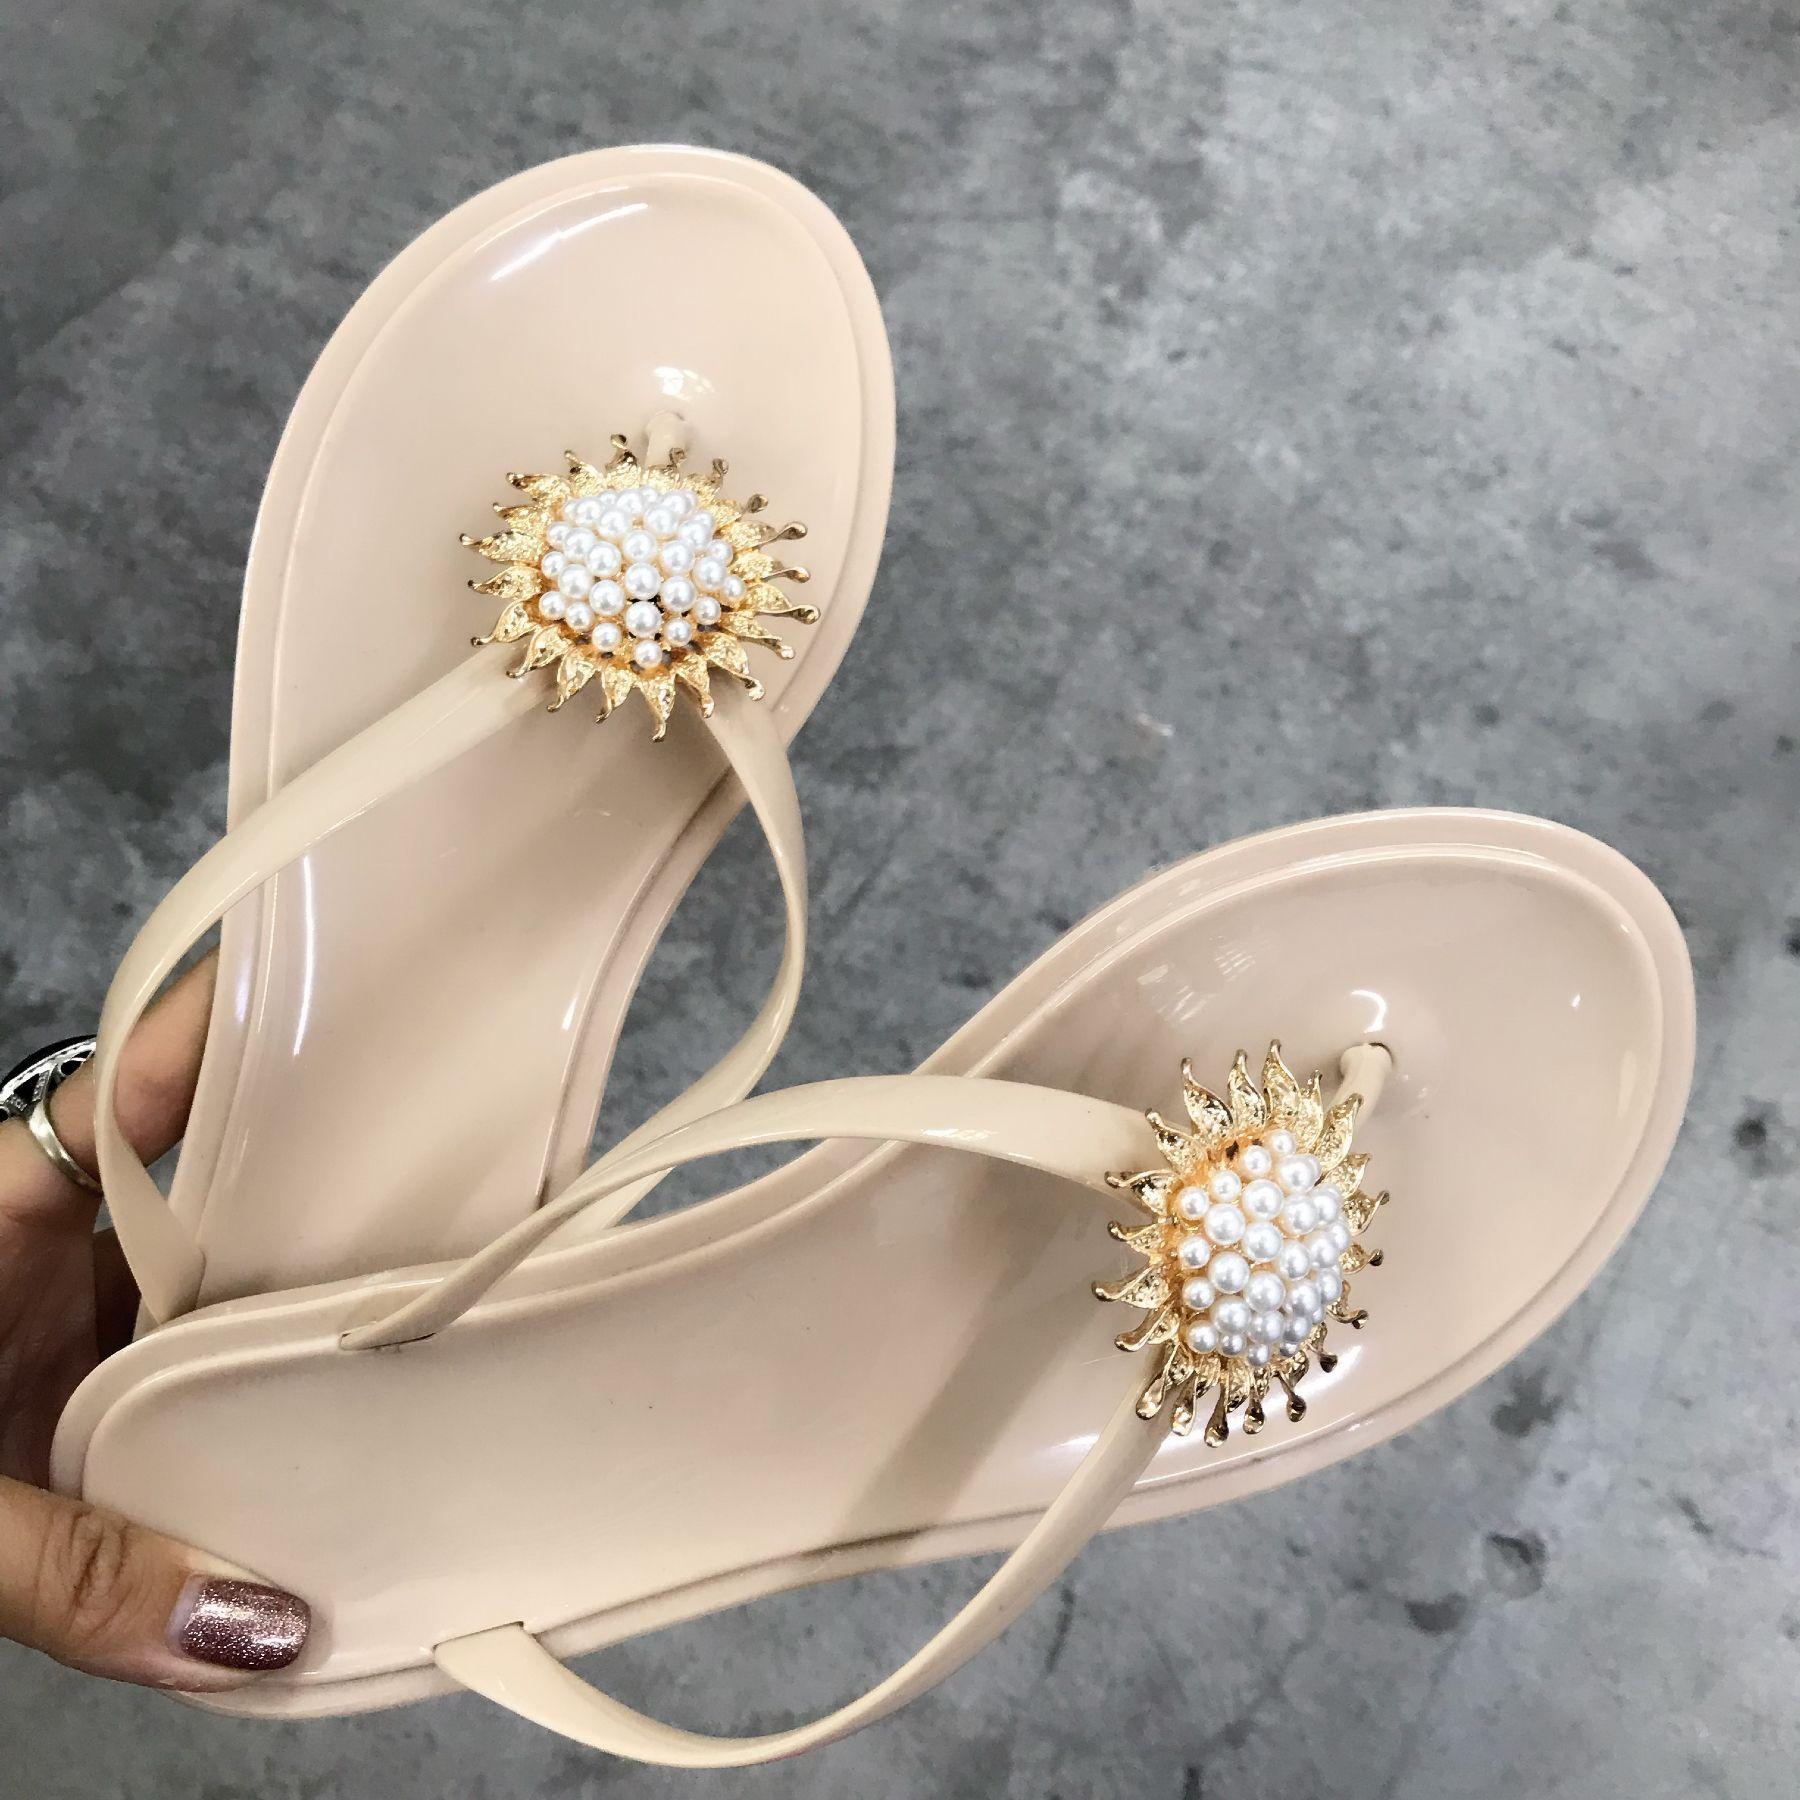 Summer Jelly Shoes fashion Transparent PVC Female Flip flops Beach Shoes Sun Flower Pearl Craft Sandals